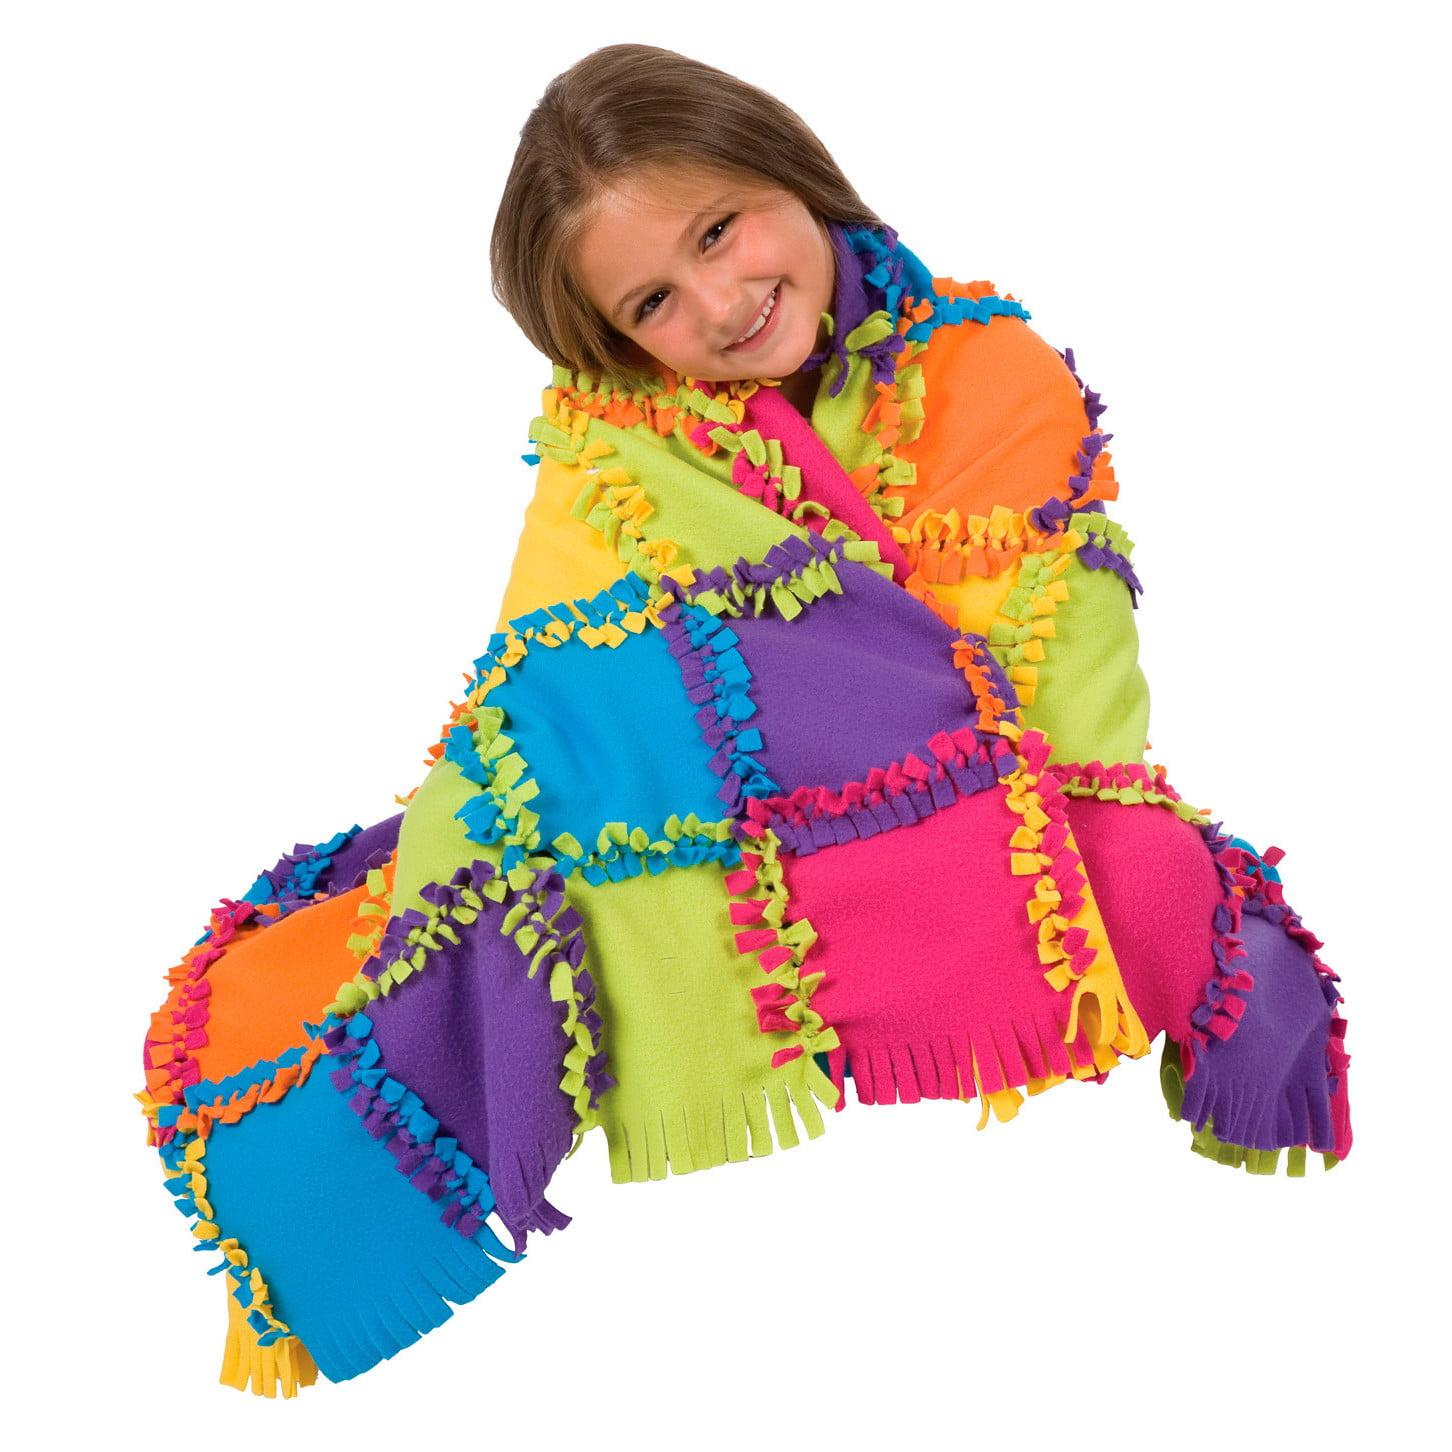 ALEX Toys Craft Knot A Quilt Kit - Walmart.com : knotting quilts - Adamdwight.com